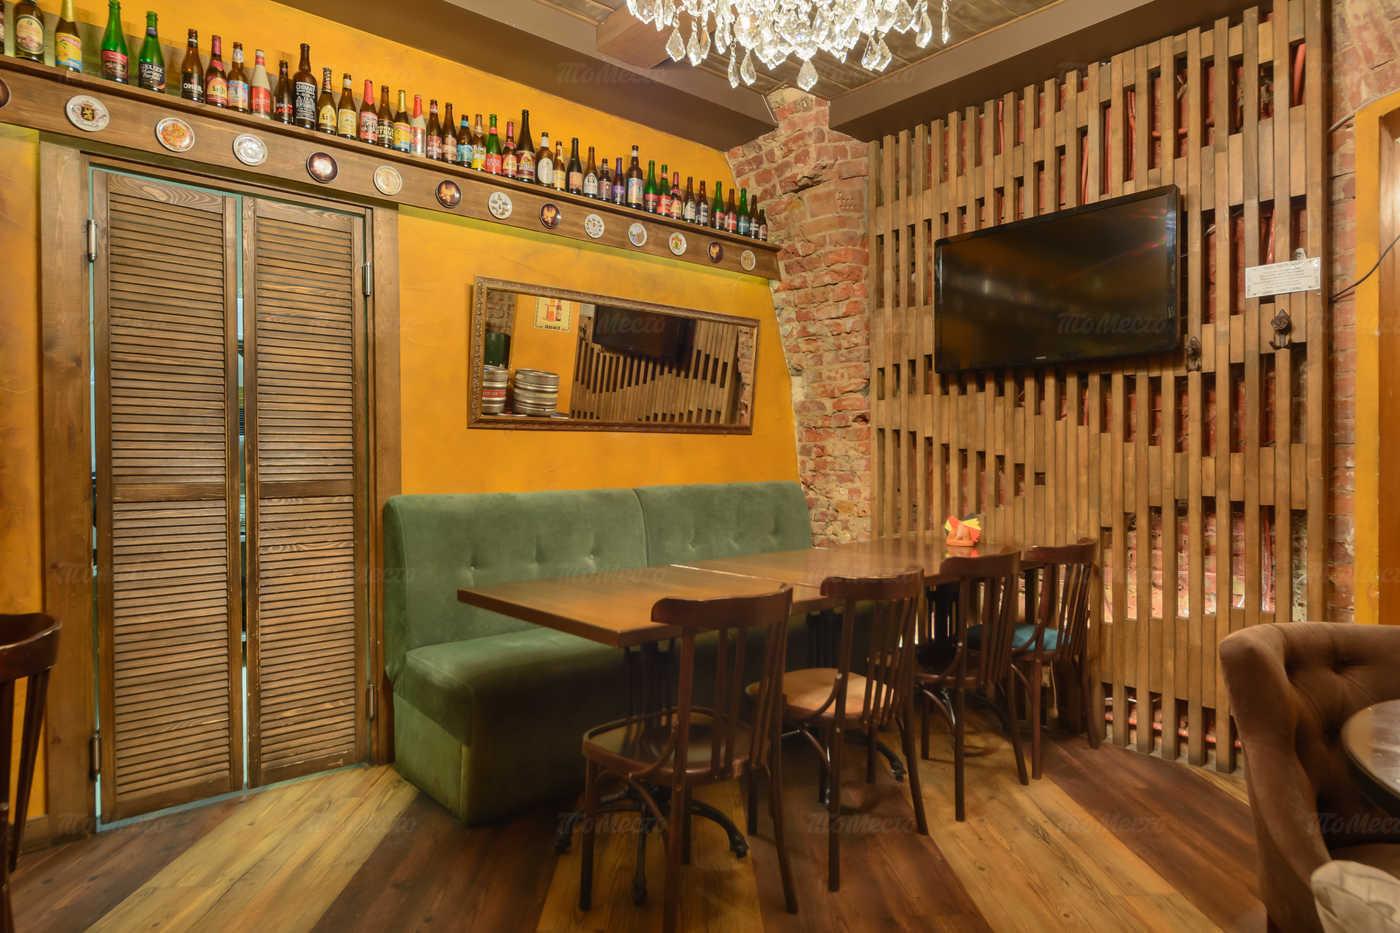 Ресторан Брассерия Крик (Brasserie Kriek) на Невском проспекте фото 5